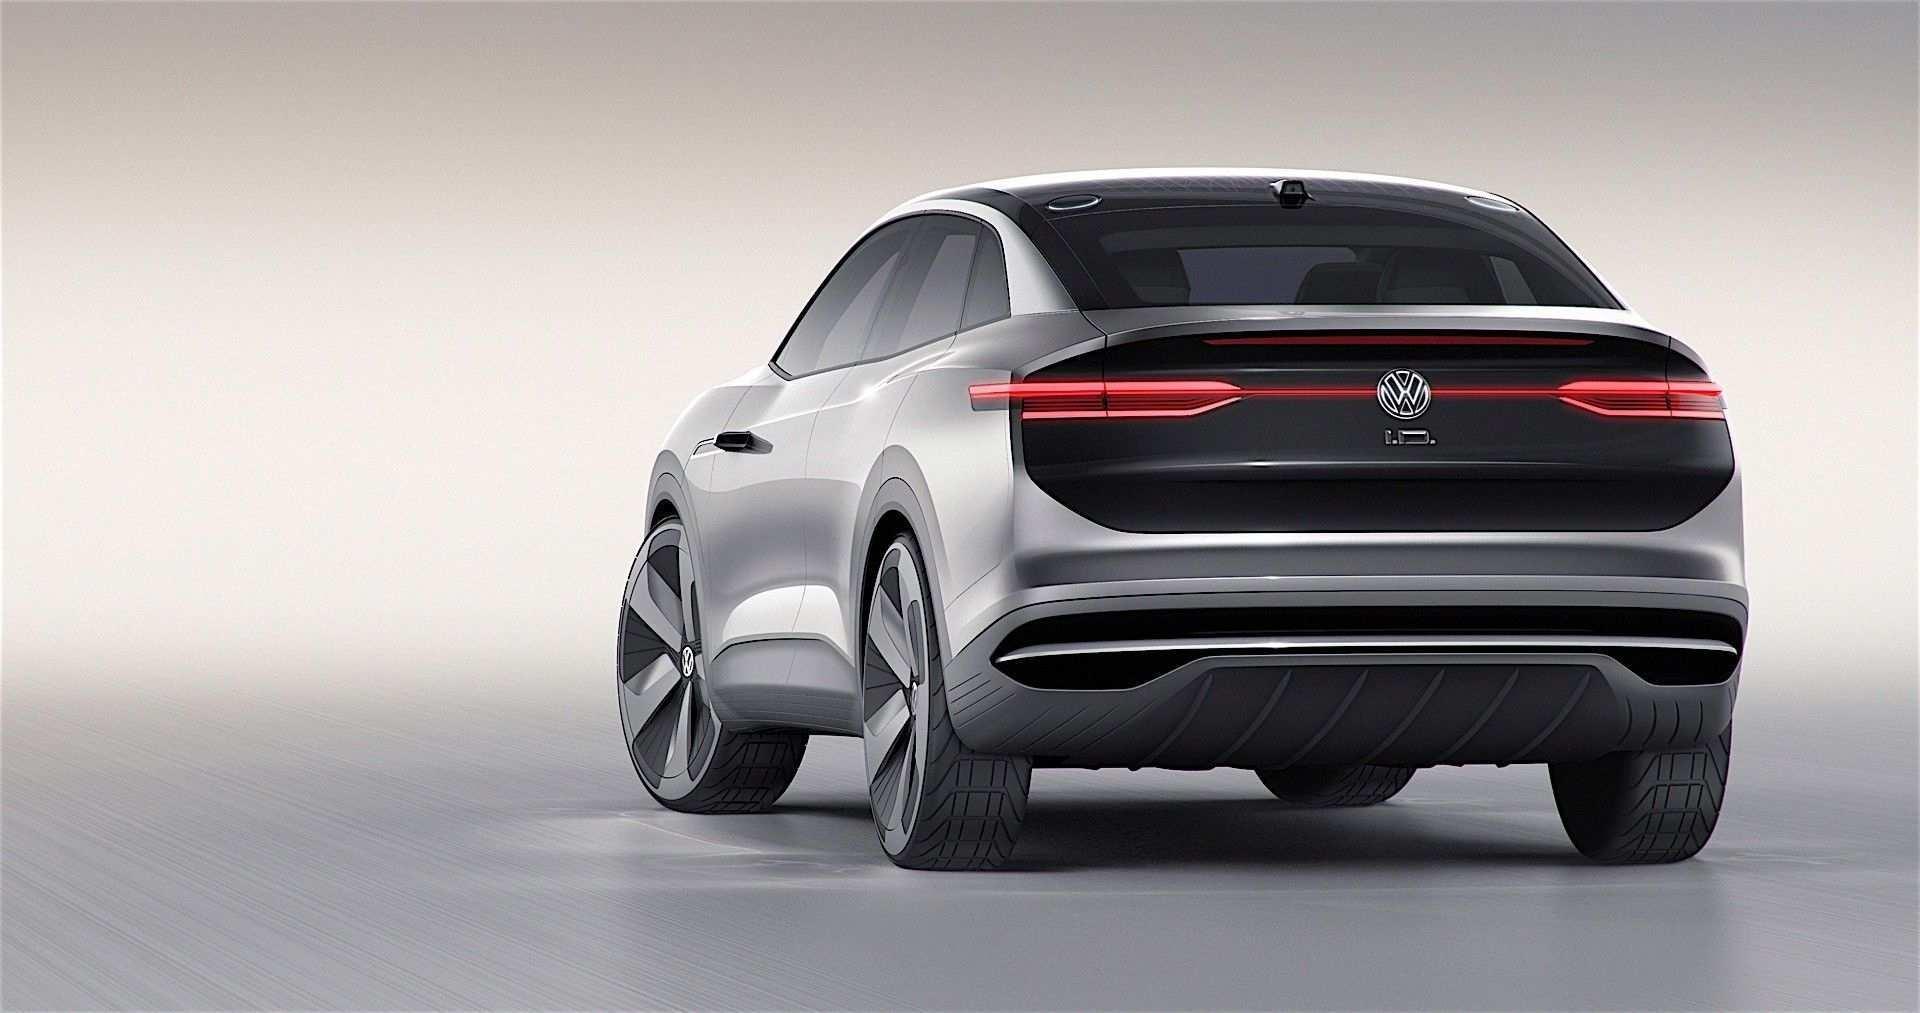 40 Concept of Volkswagen Ev 2019 Style for Volkswagen Ev 2019